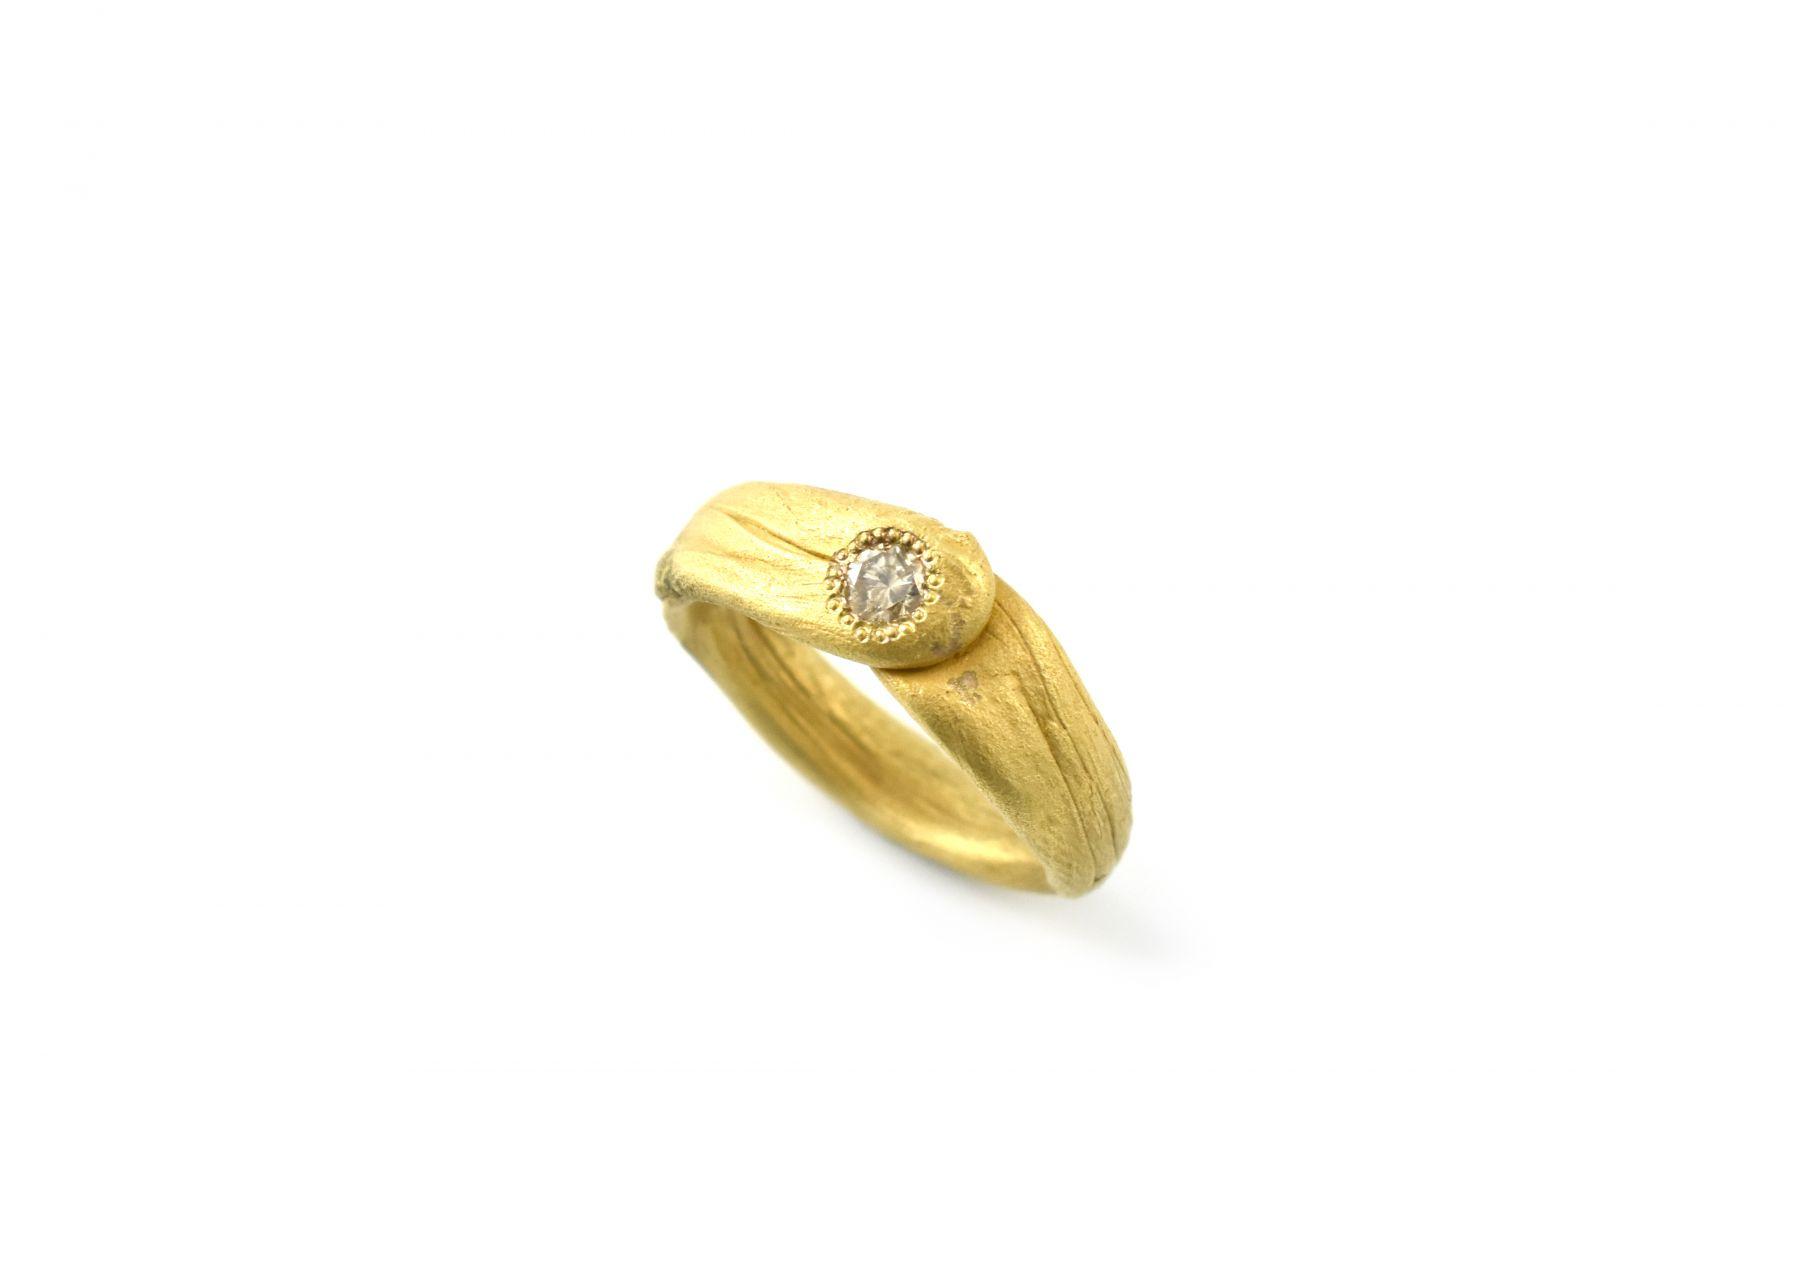 Karl Fritsch Rings, German, Jewelry, Karl Fritsch